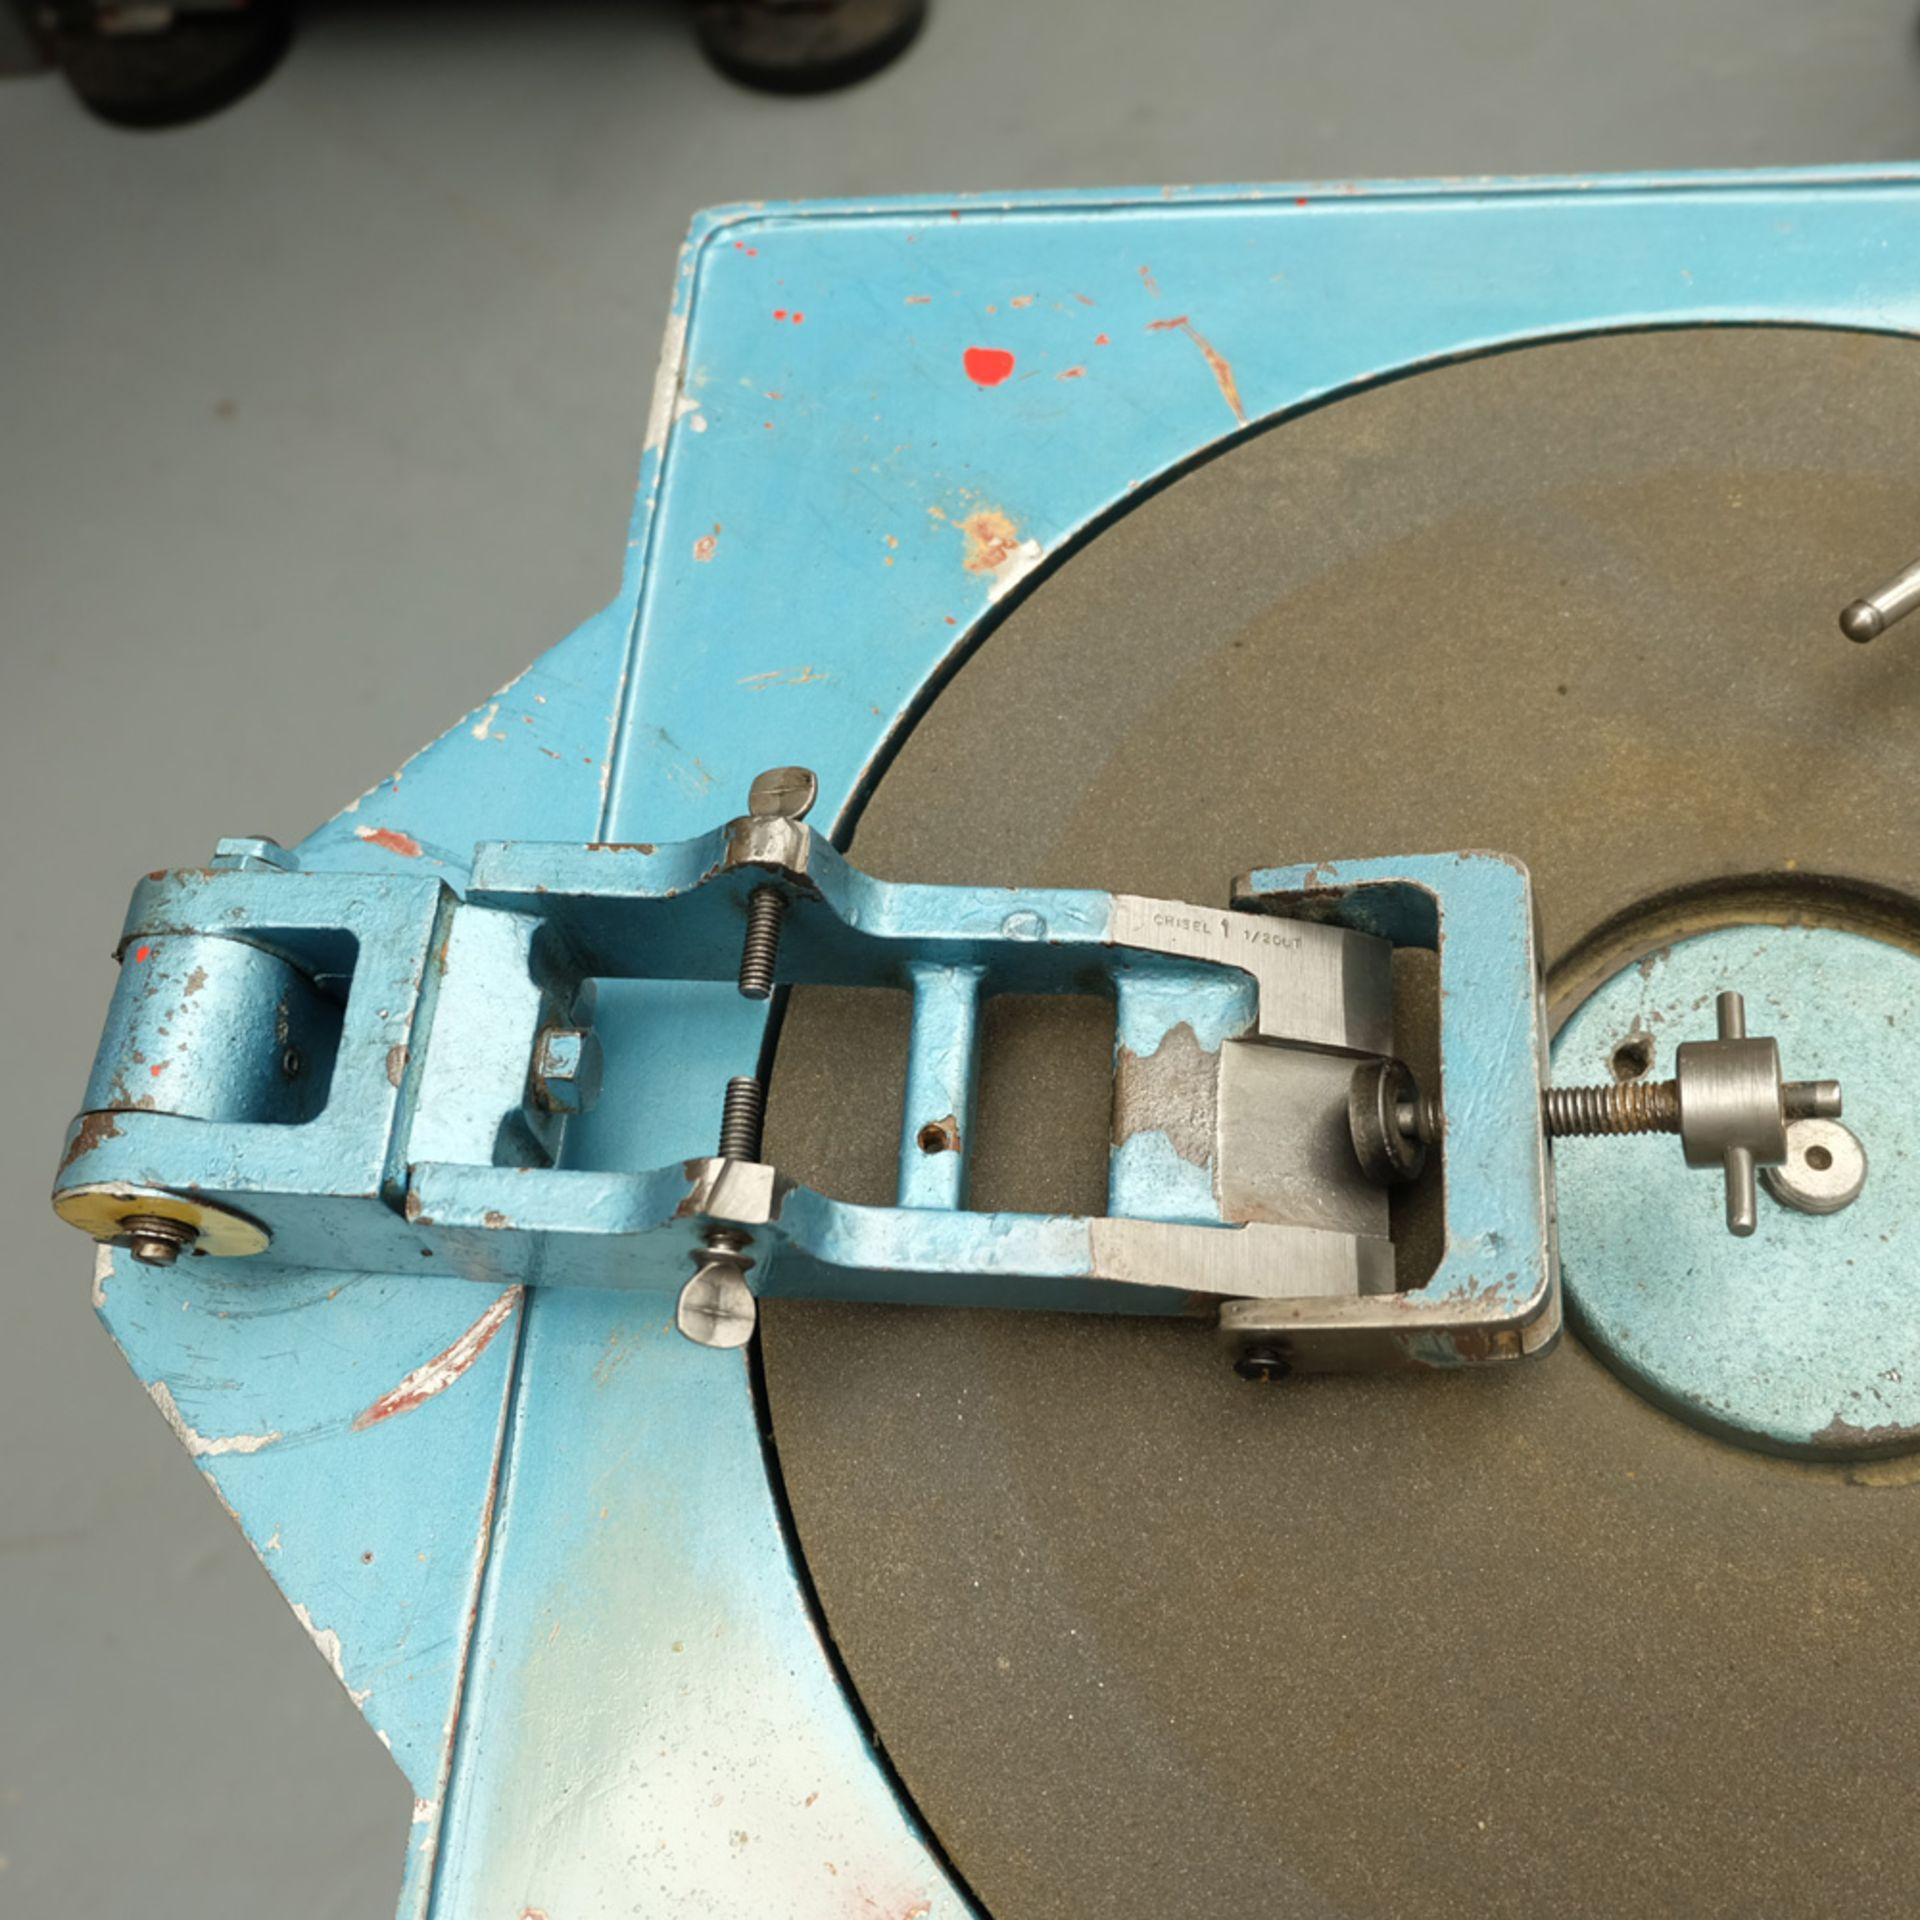 Viceroy Sharpedge Model TDS 12/16 Edge Tool Sharpening Machine. - Image 3 of 6